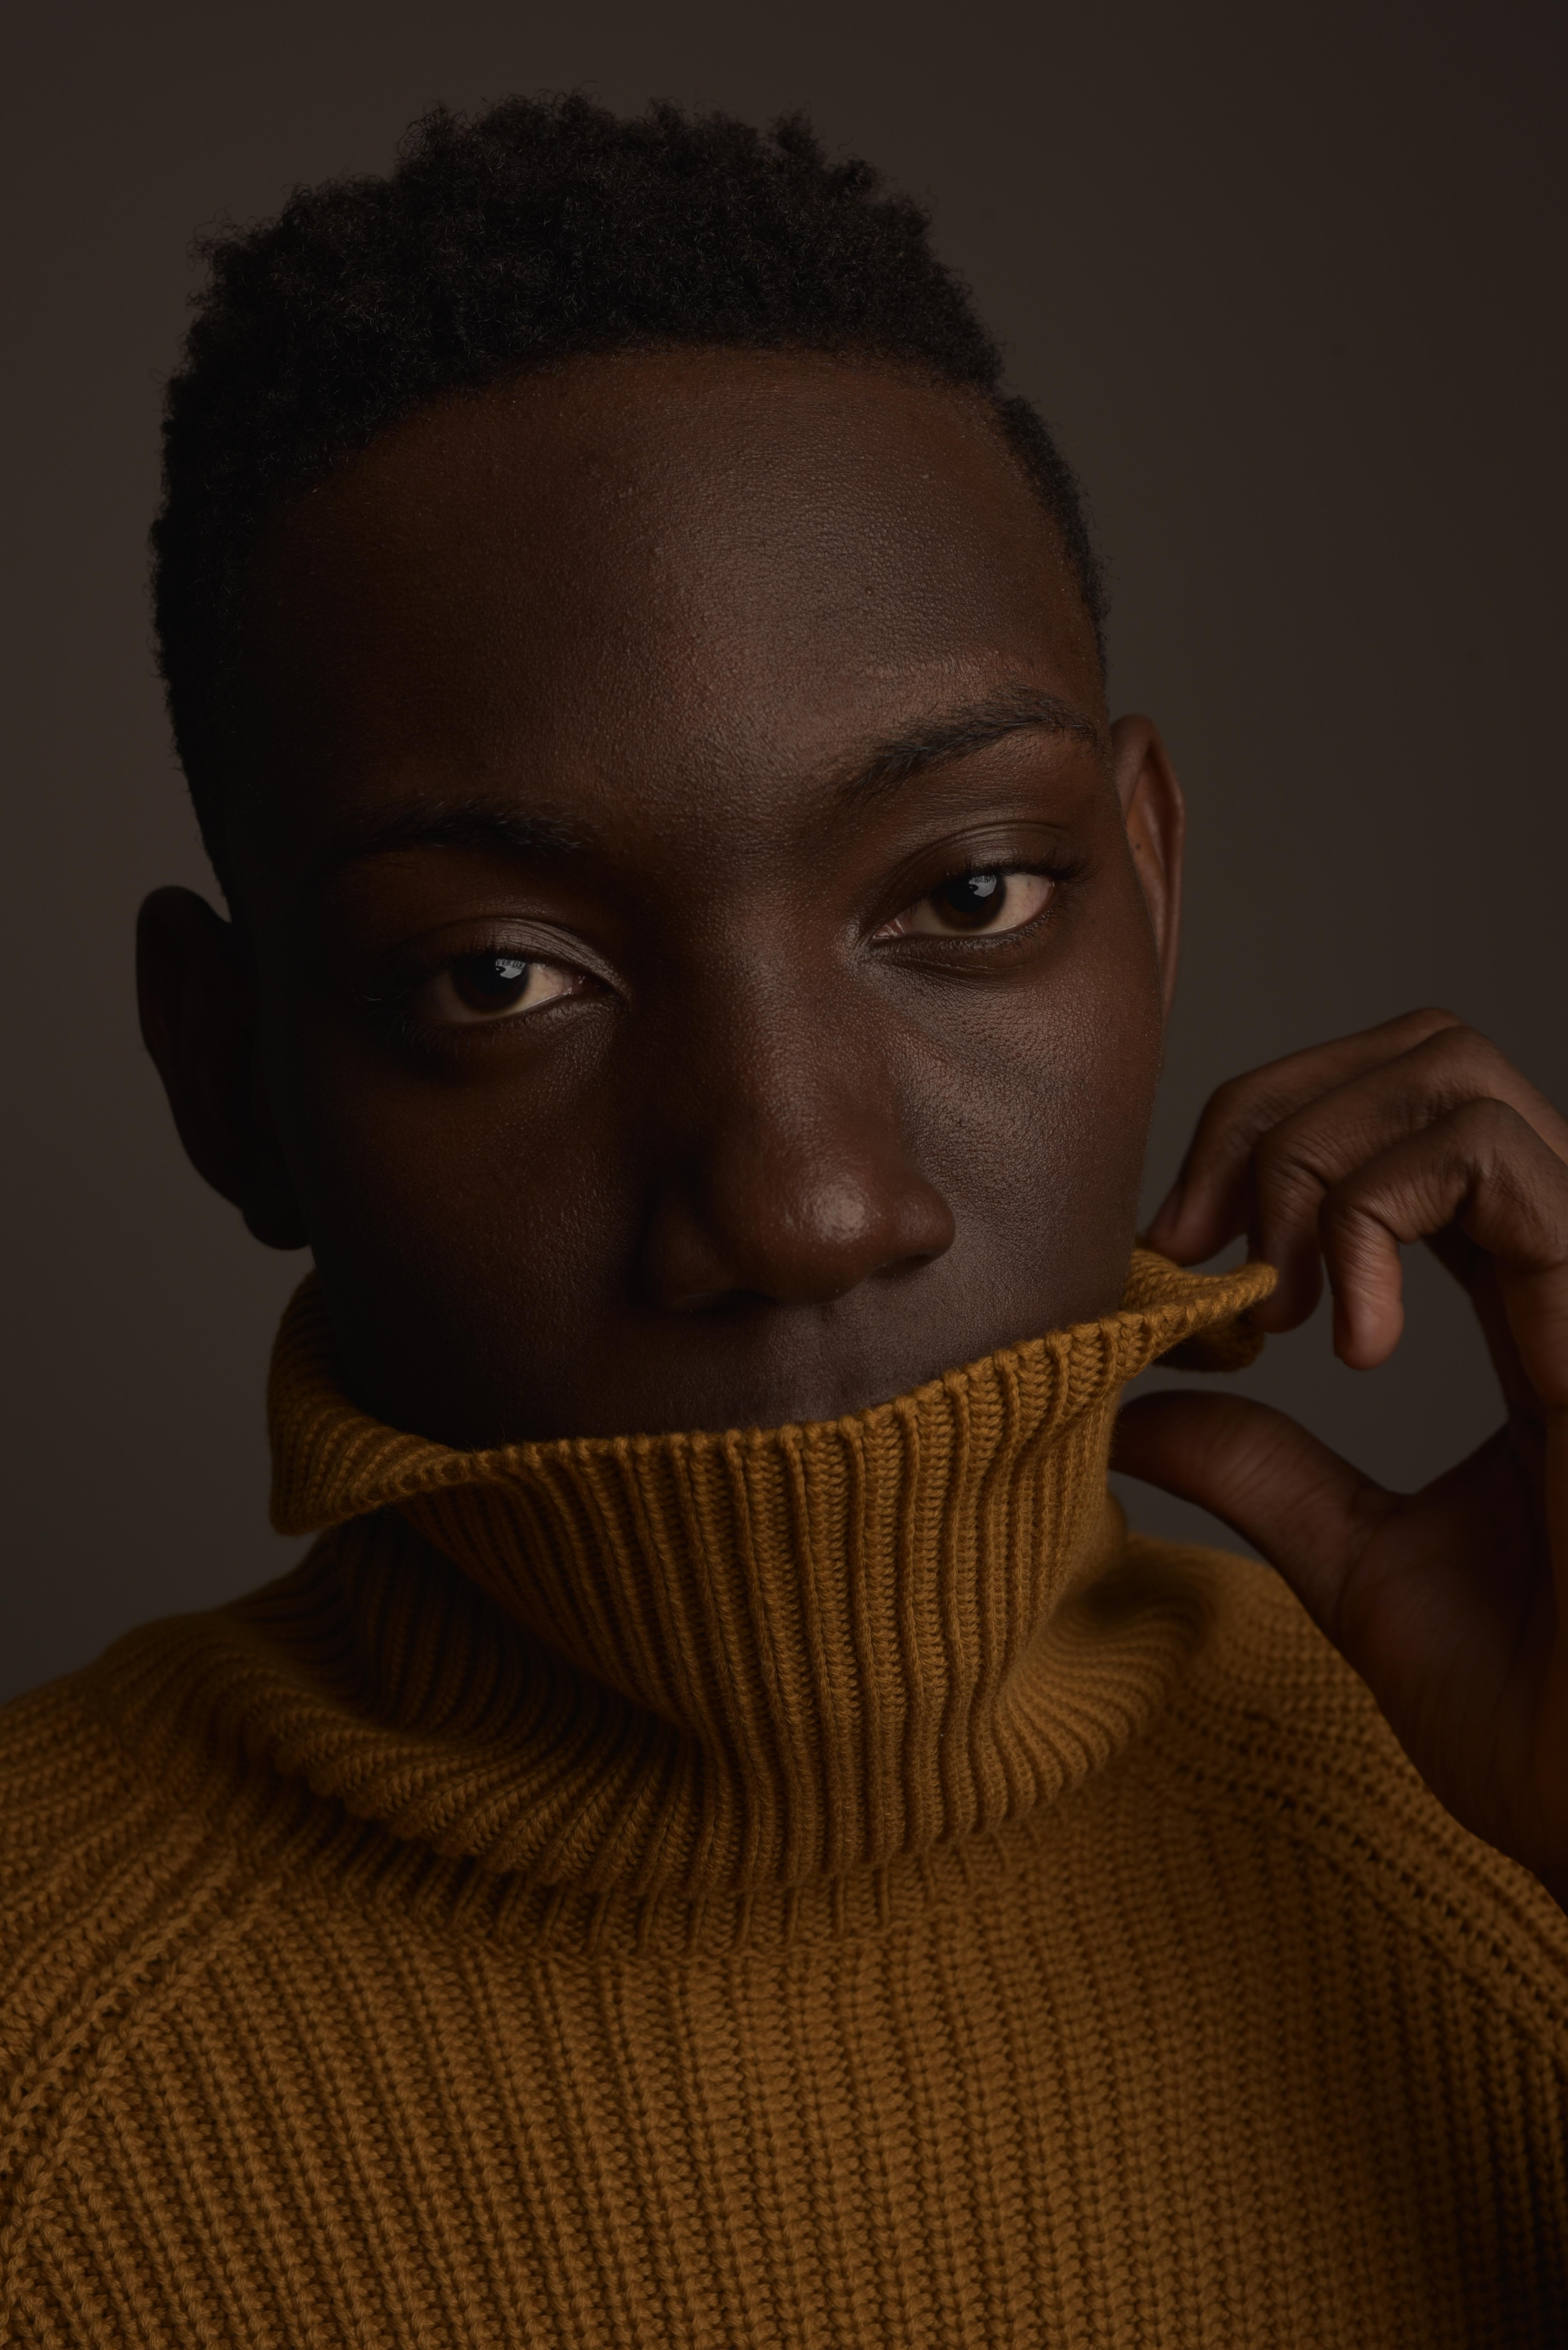 Man in Brown Turtleneck Sweater